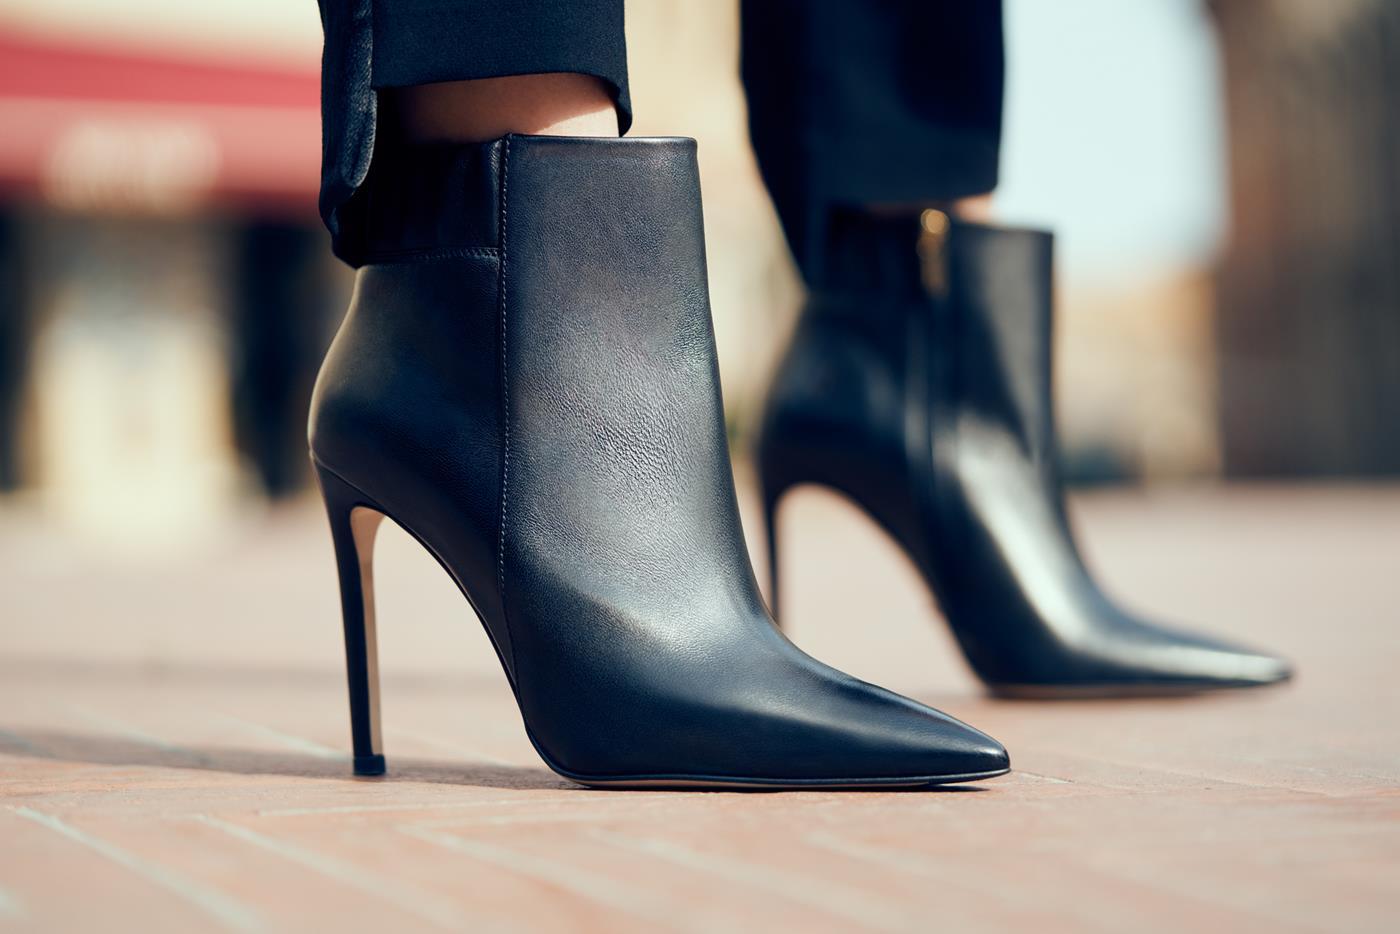 Dámske topánky, ktoré nikdy nevyjdú z módy